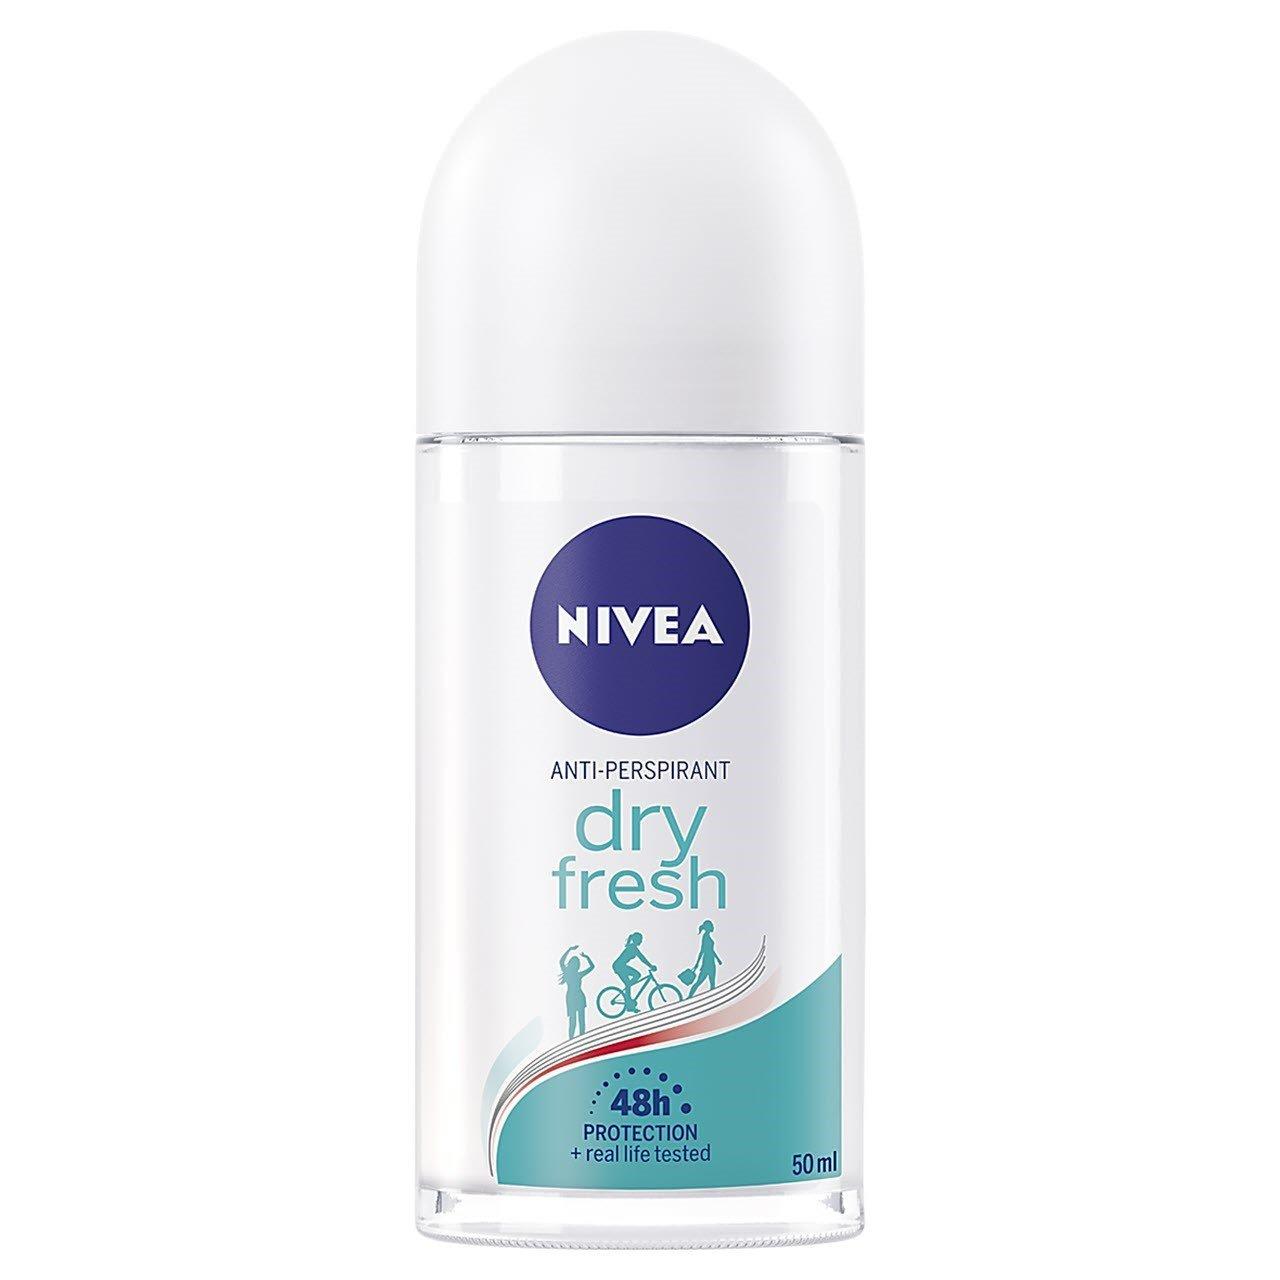 رول ضد تعریق زنانه نیوآ مدل Dry Fresh حجم 50 میلی لیتر